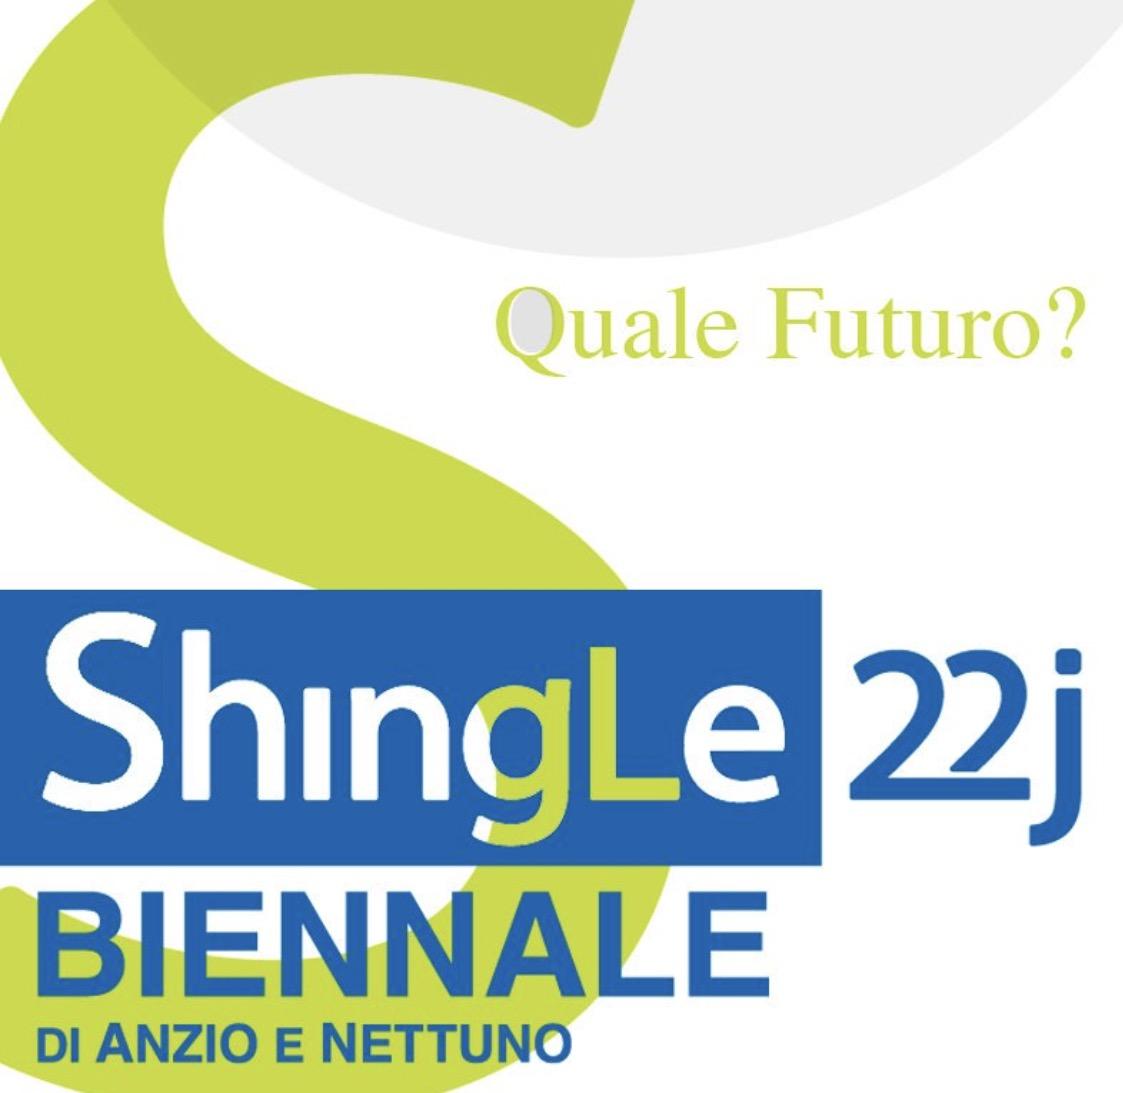 Shingle22-a